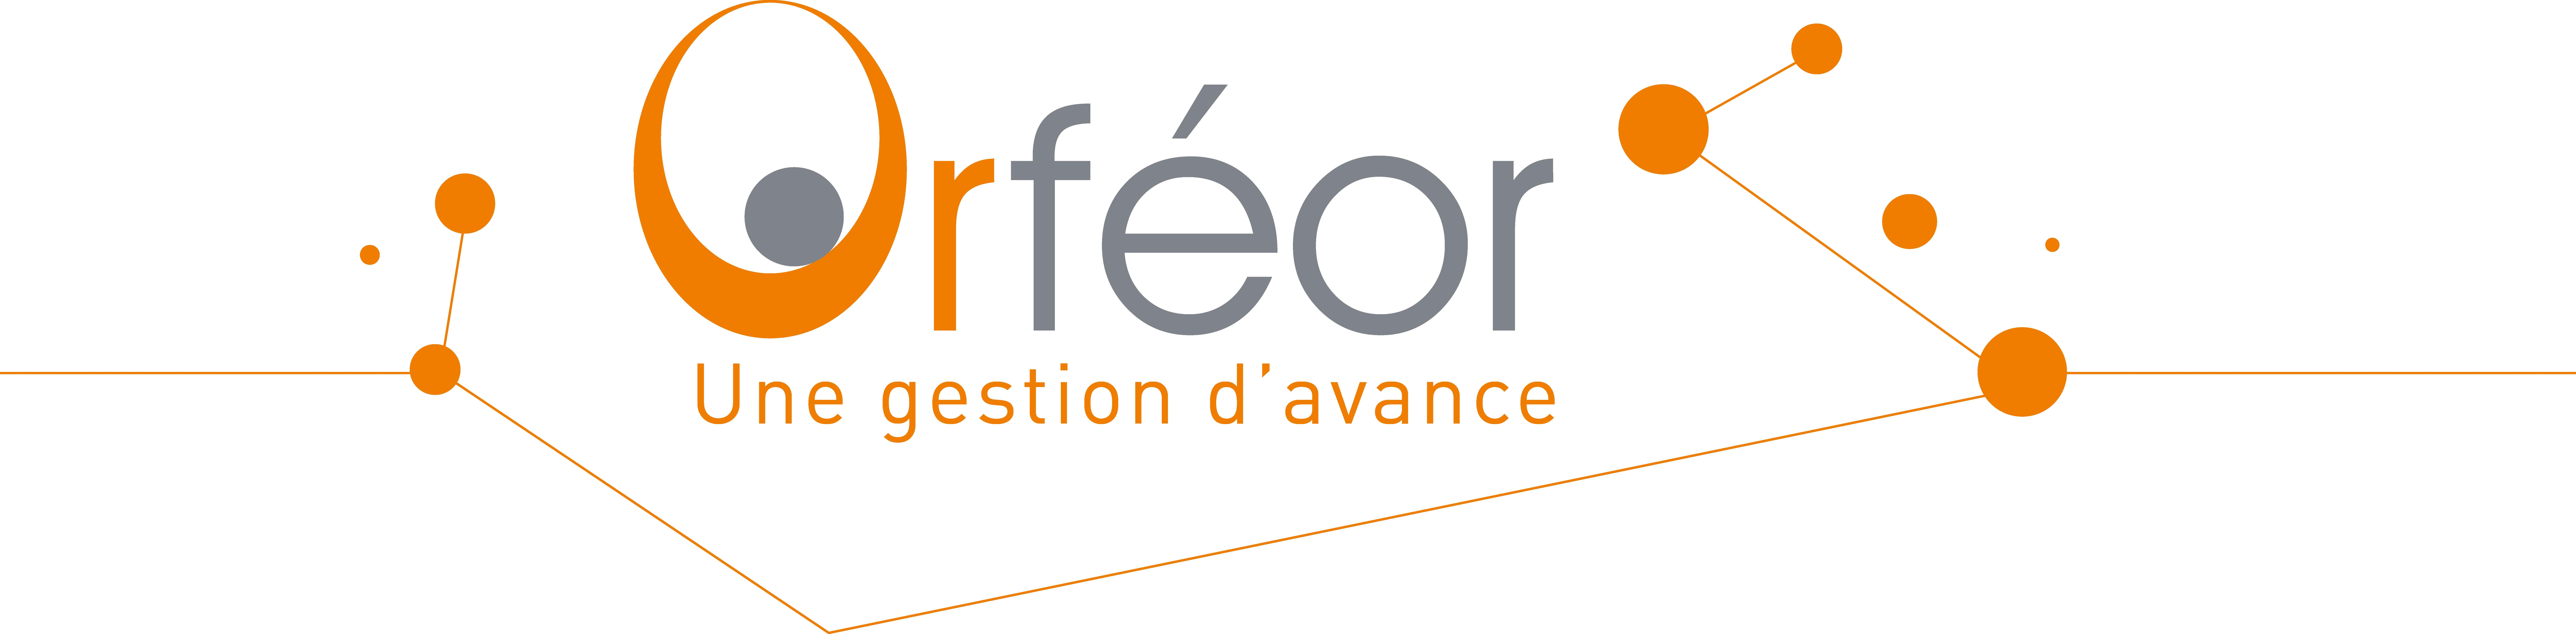 Logo Orfeor